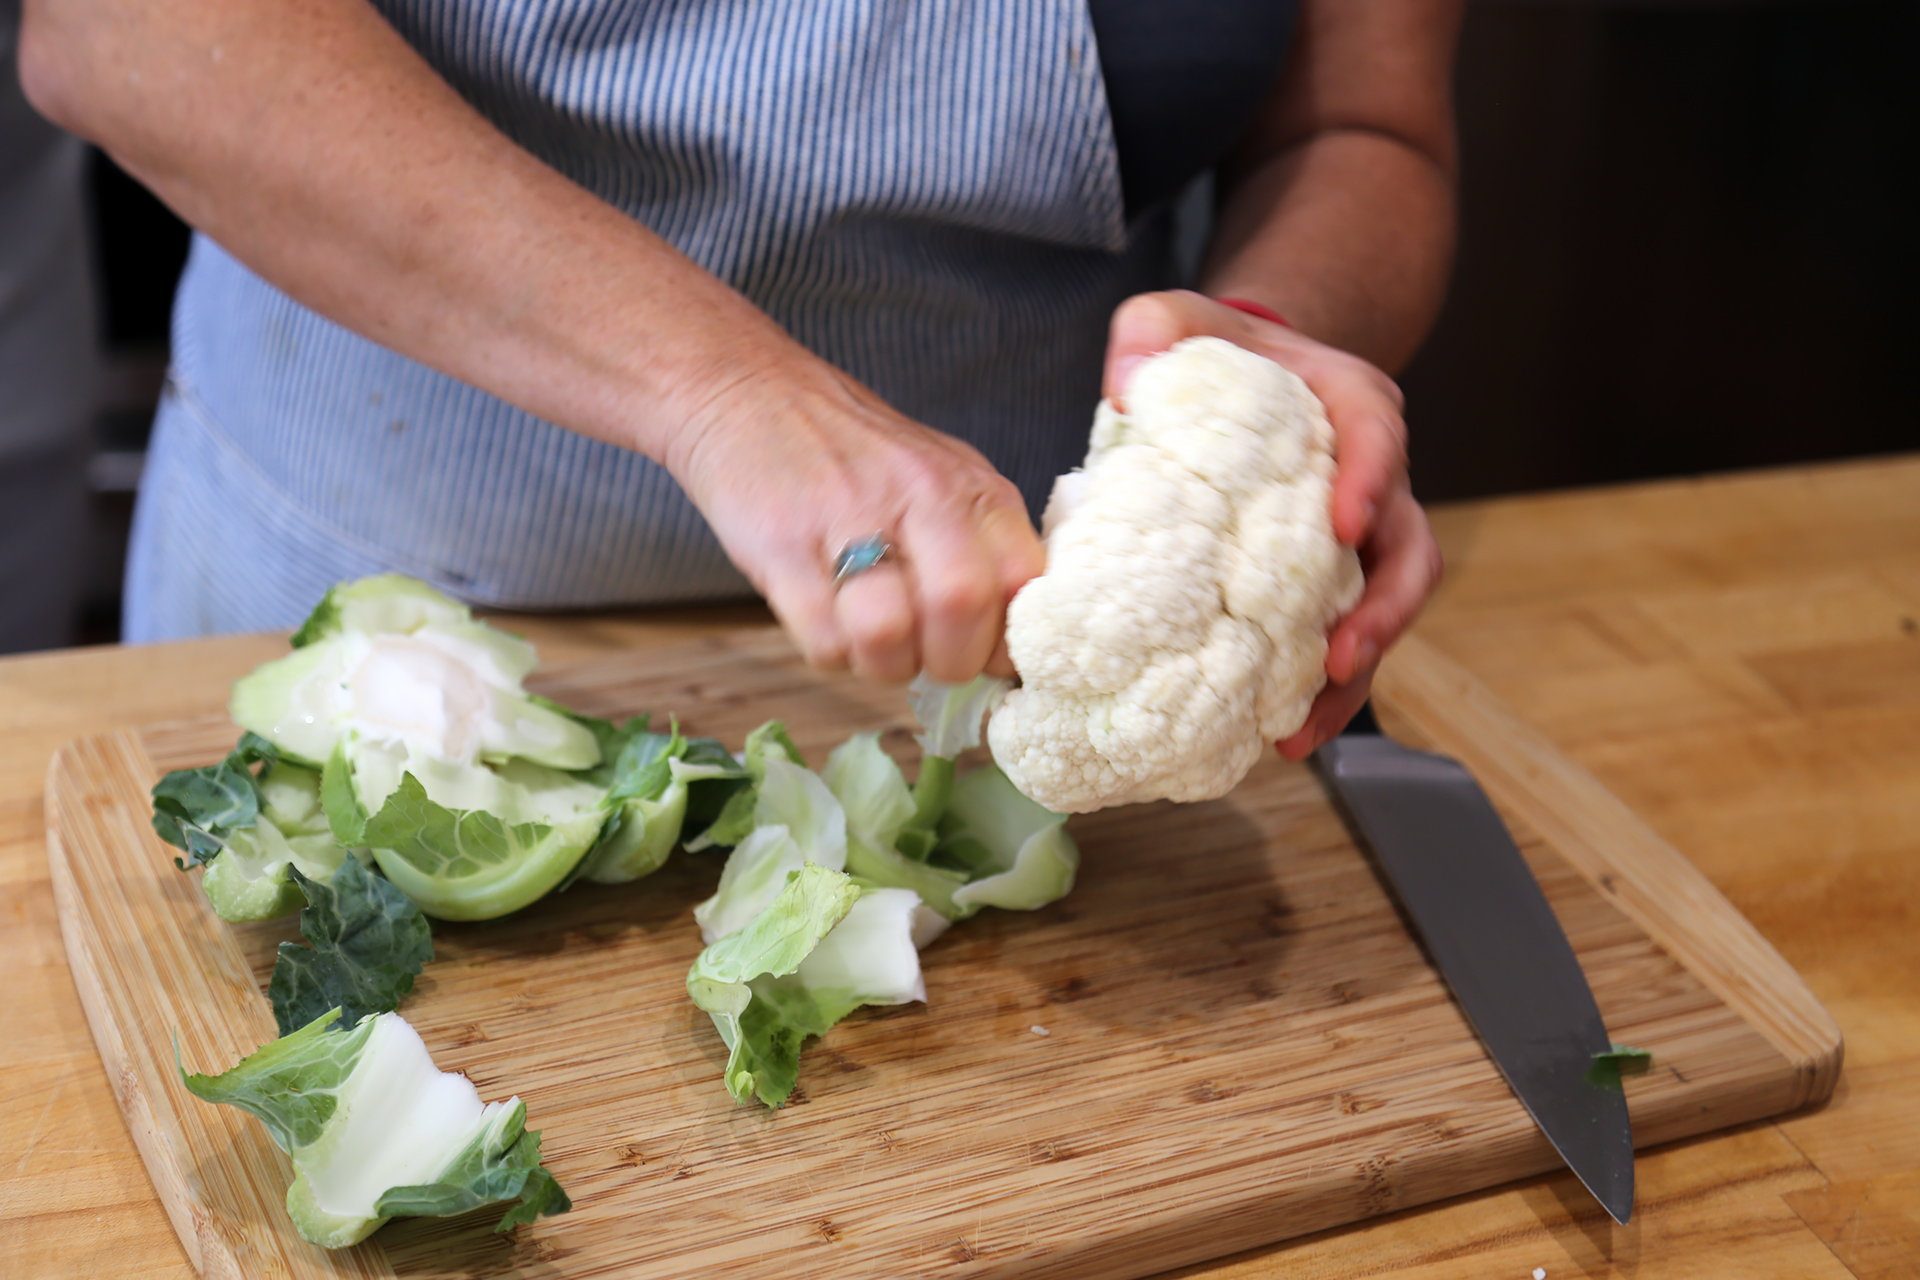 Prepping the cauliflower